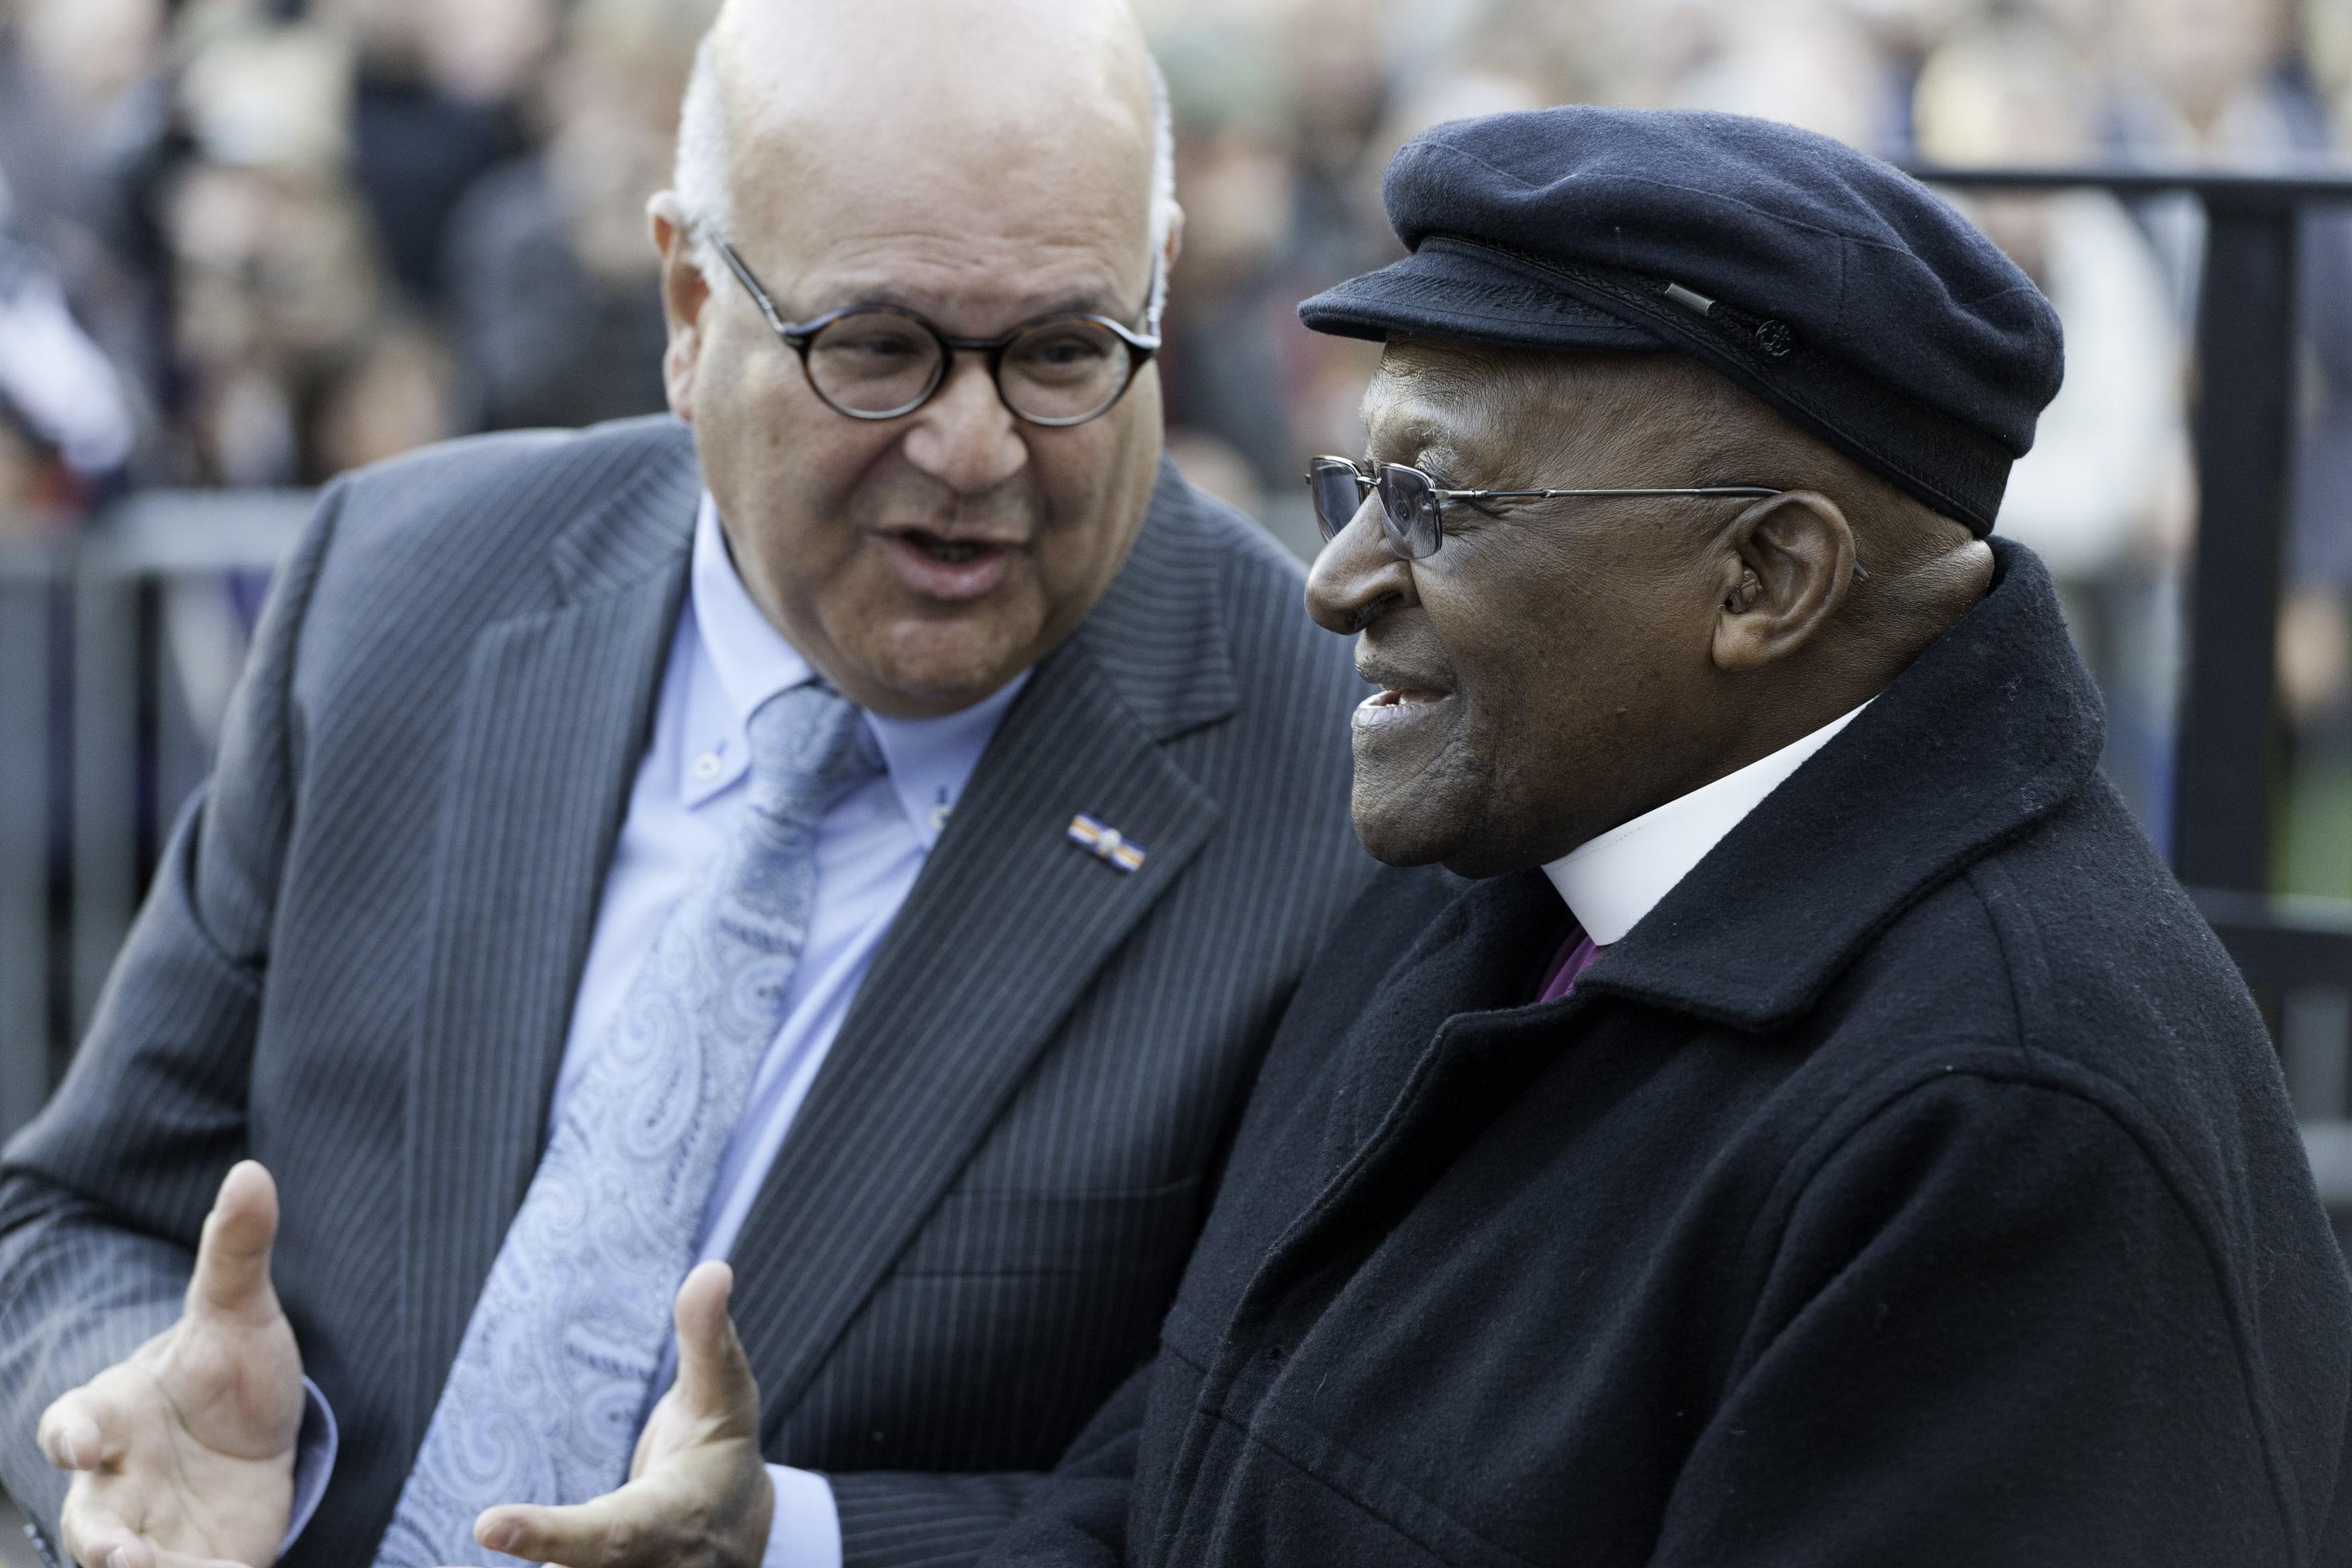 Harold Robles met Desmond Tutu